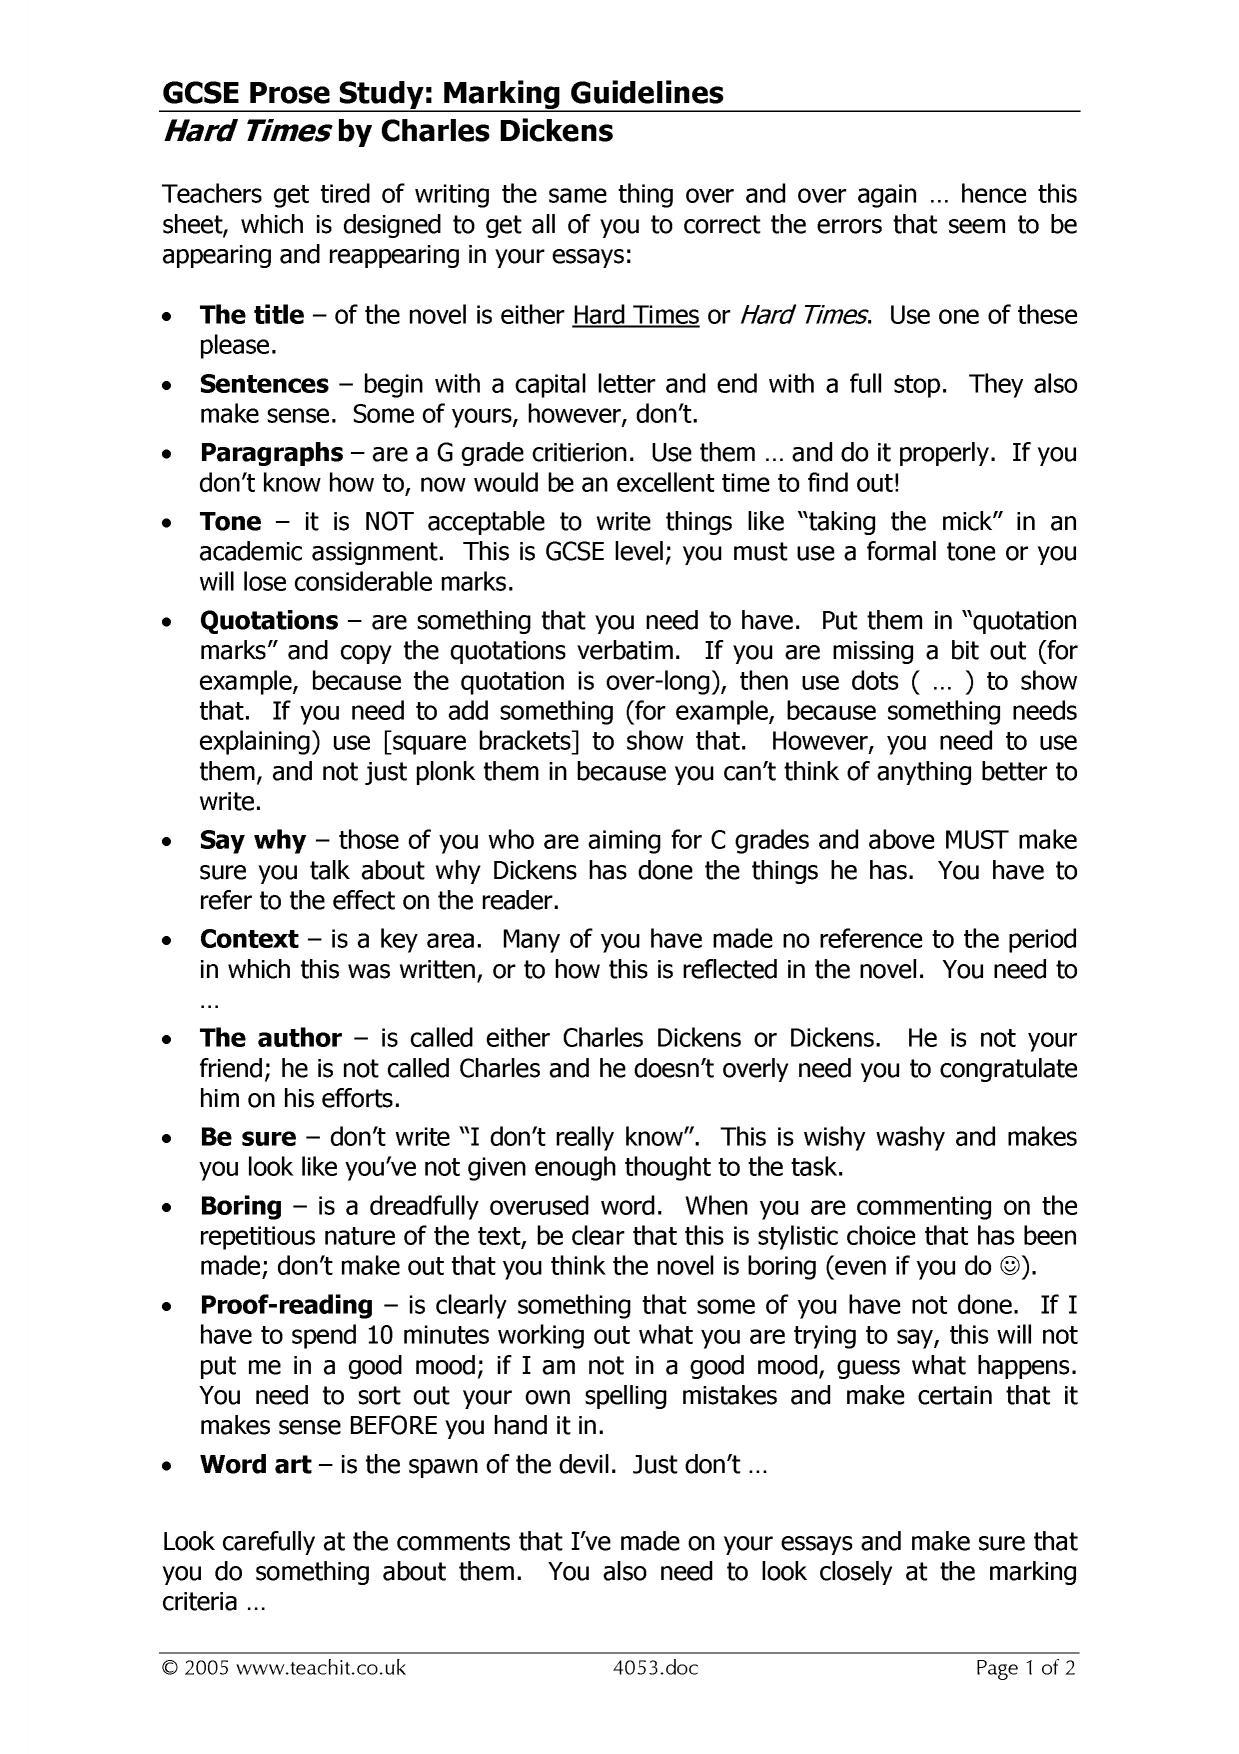 hard times study guide pdf